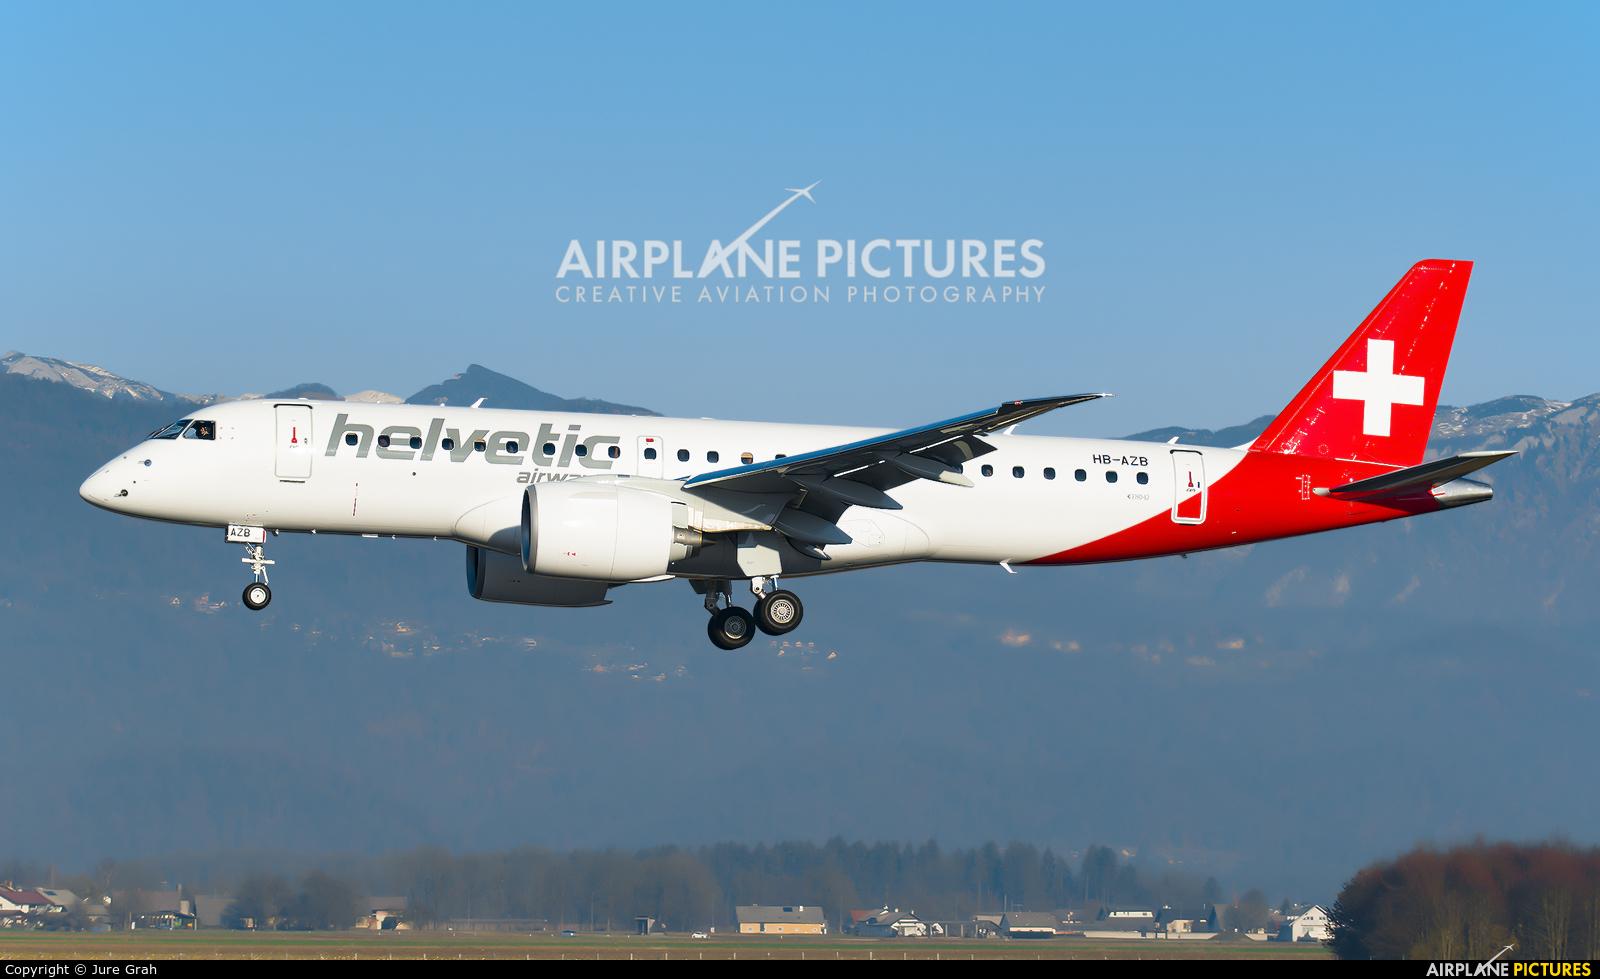 Helvetic Airways HB-AZB aircraft at Ljubljana - Brnik